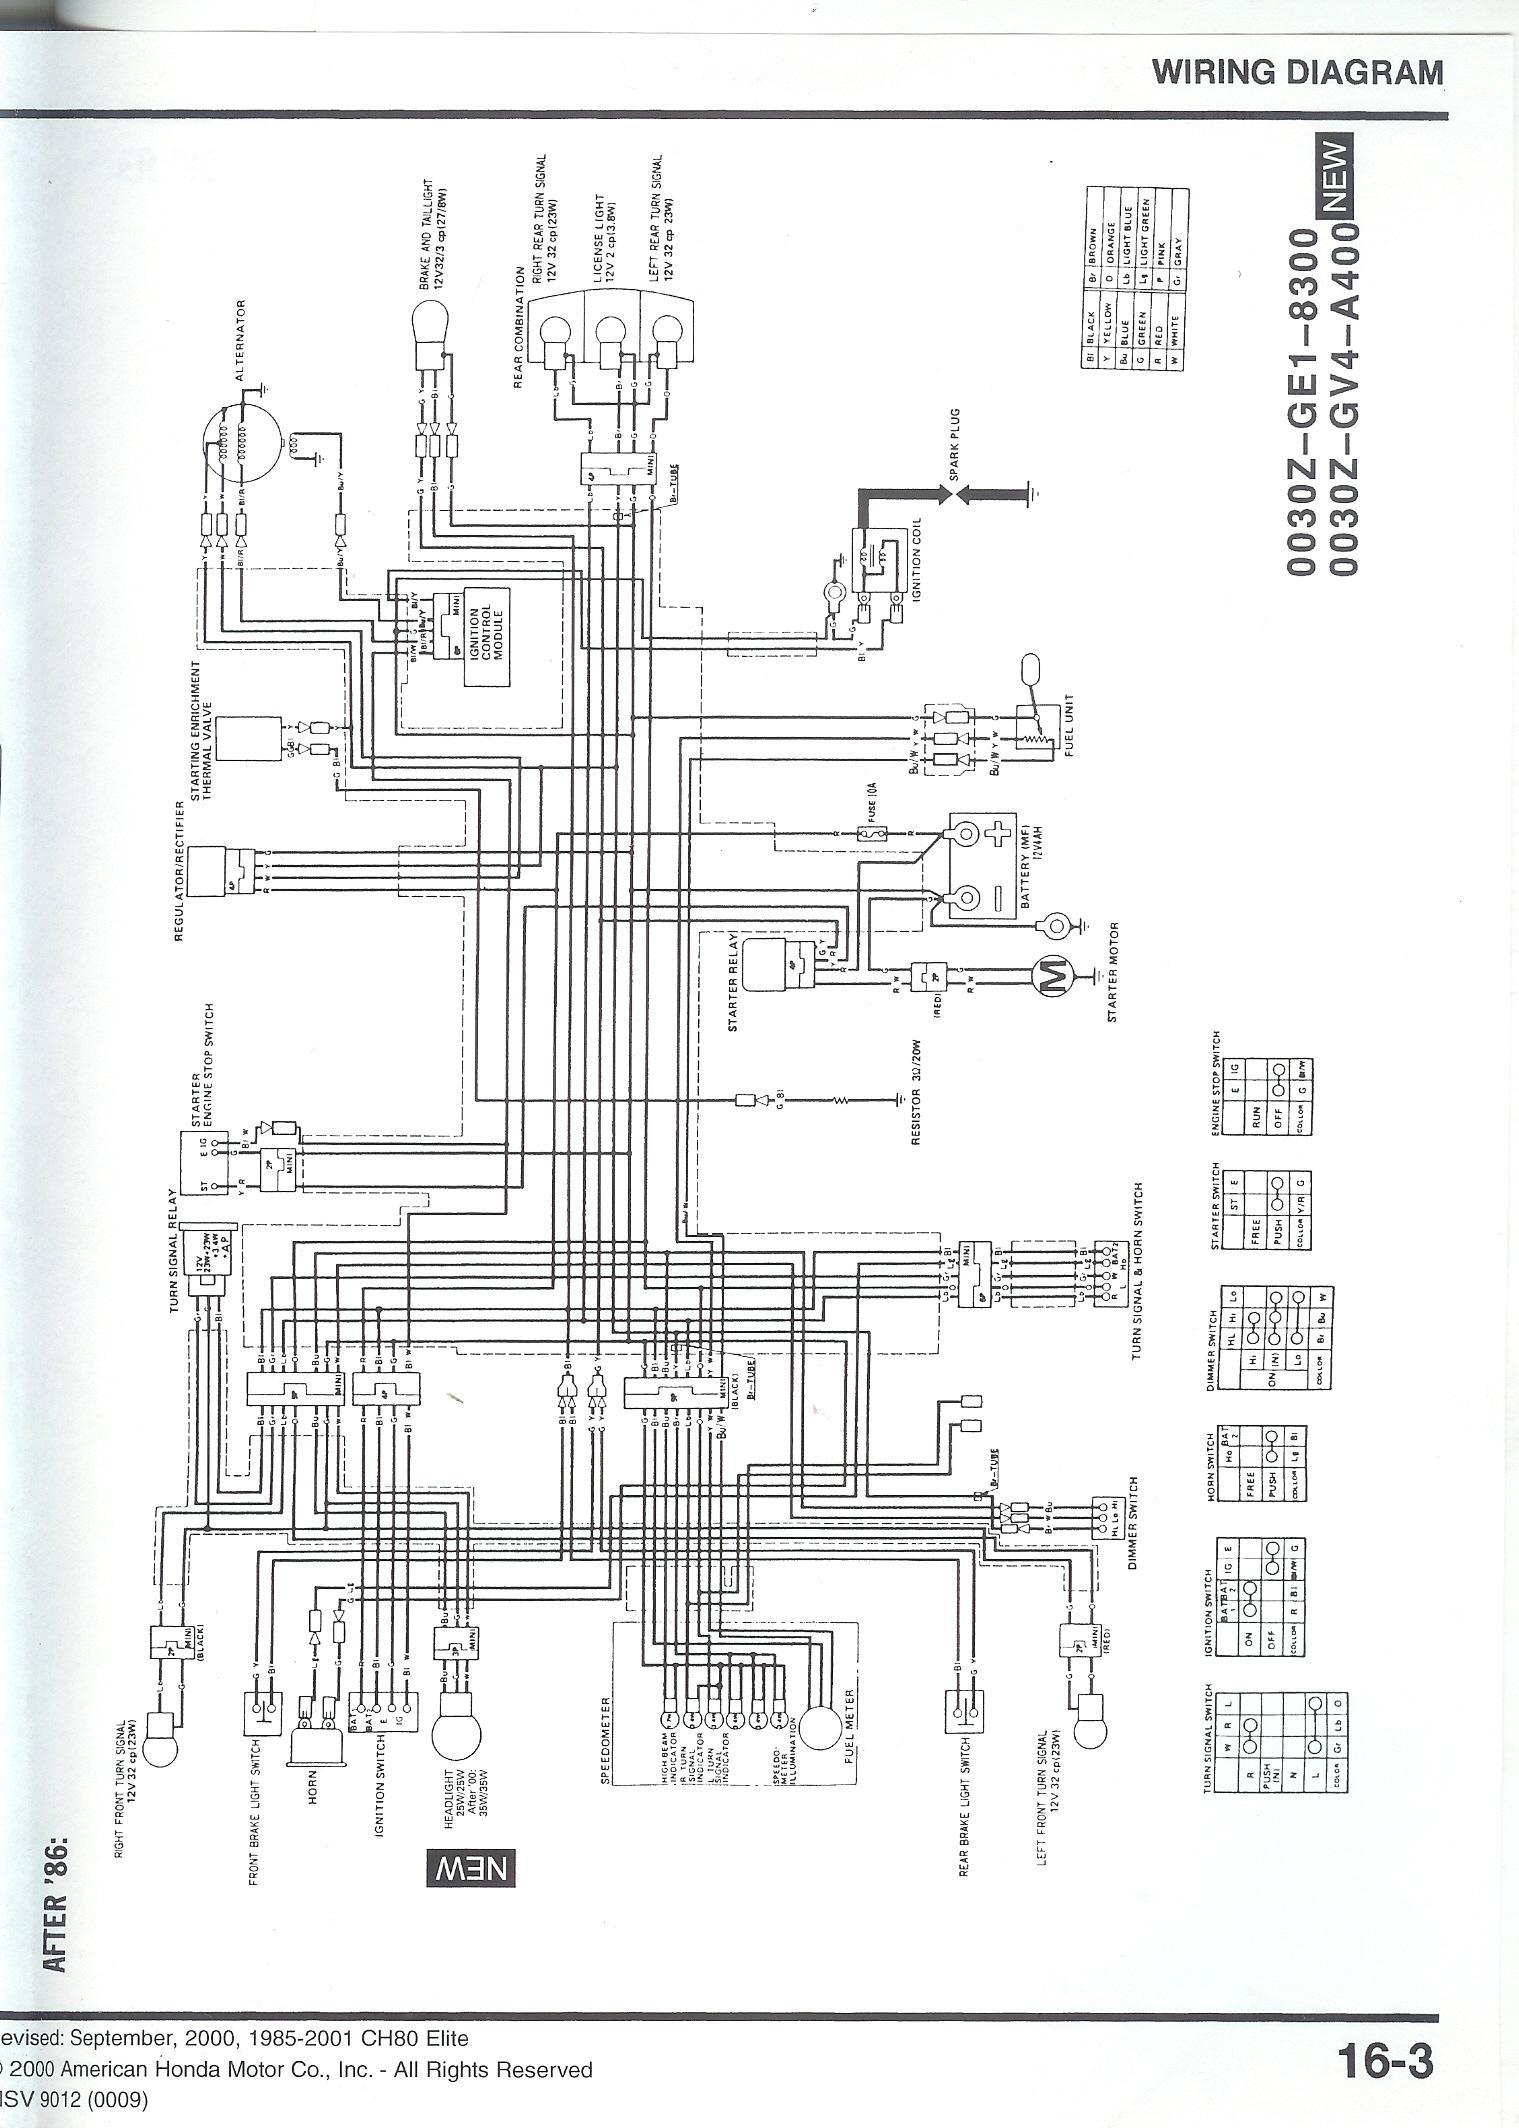 Aero Automotive Wiring Harness : Honda elite ch wiring diagram auto parts